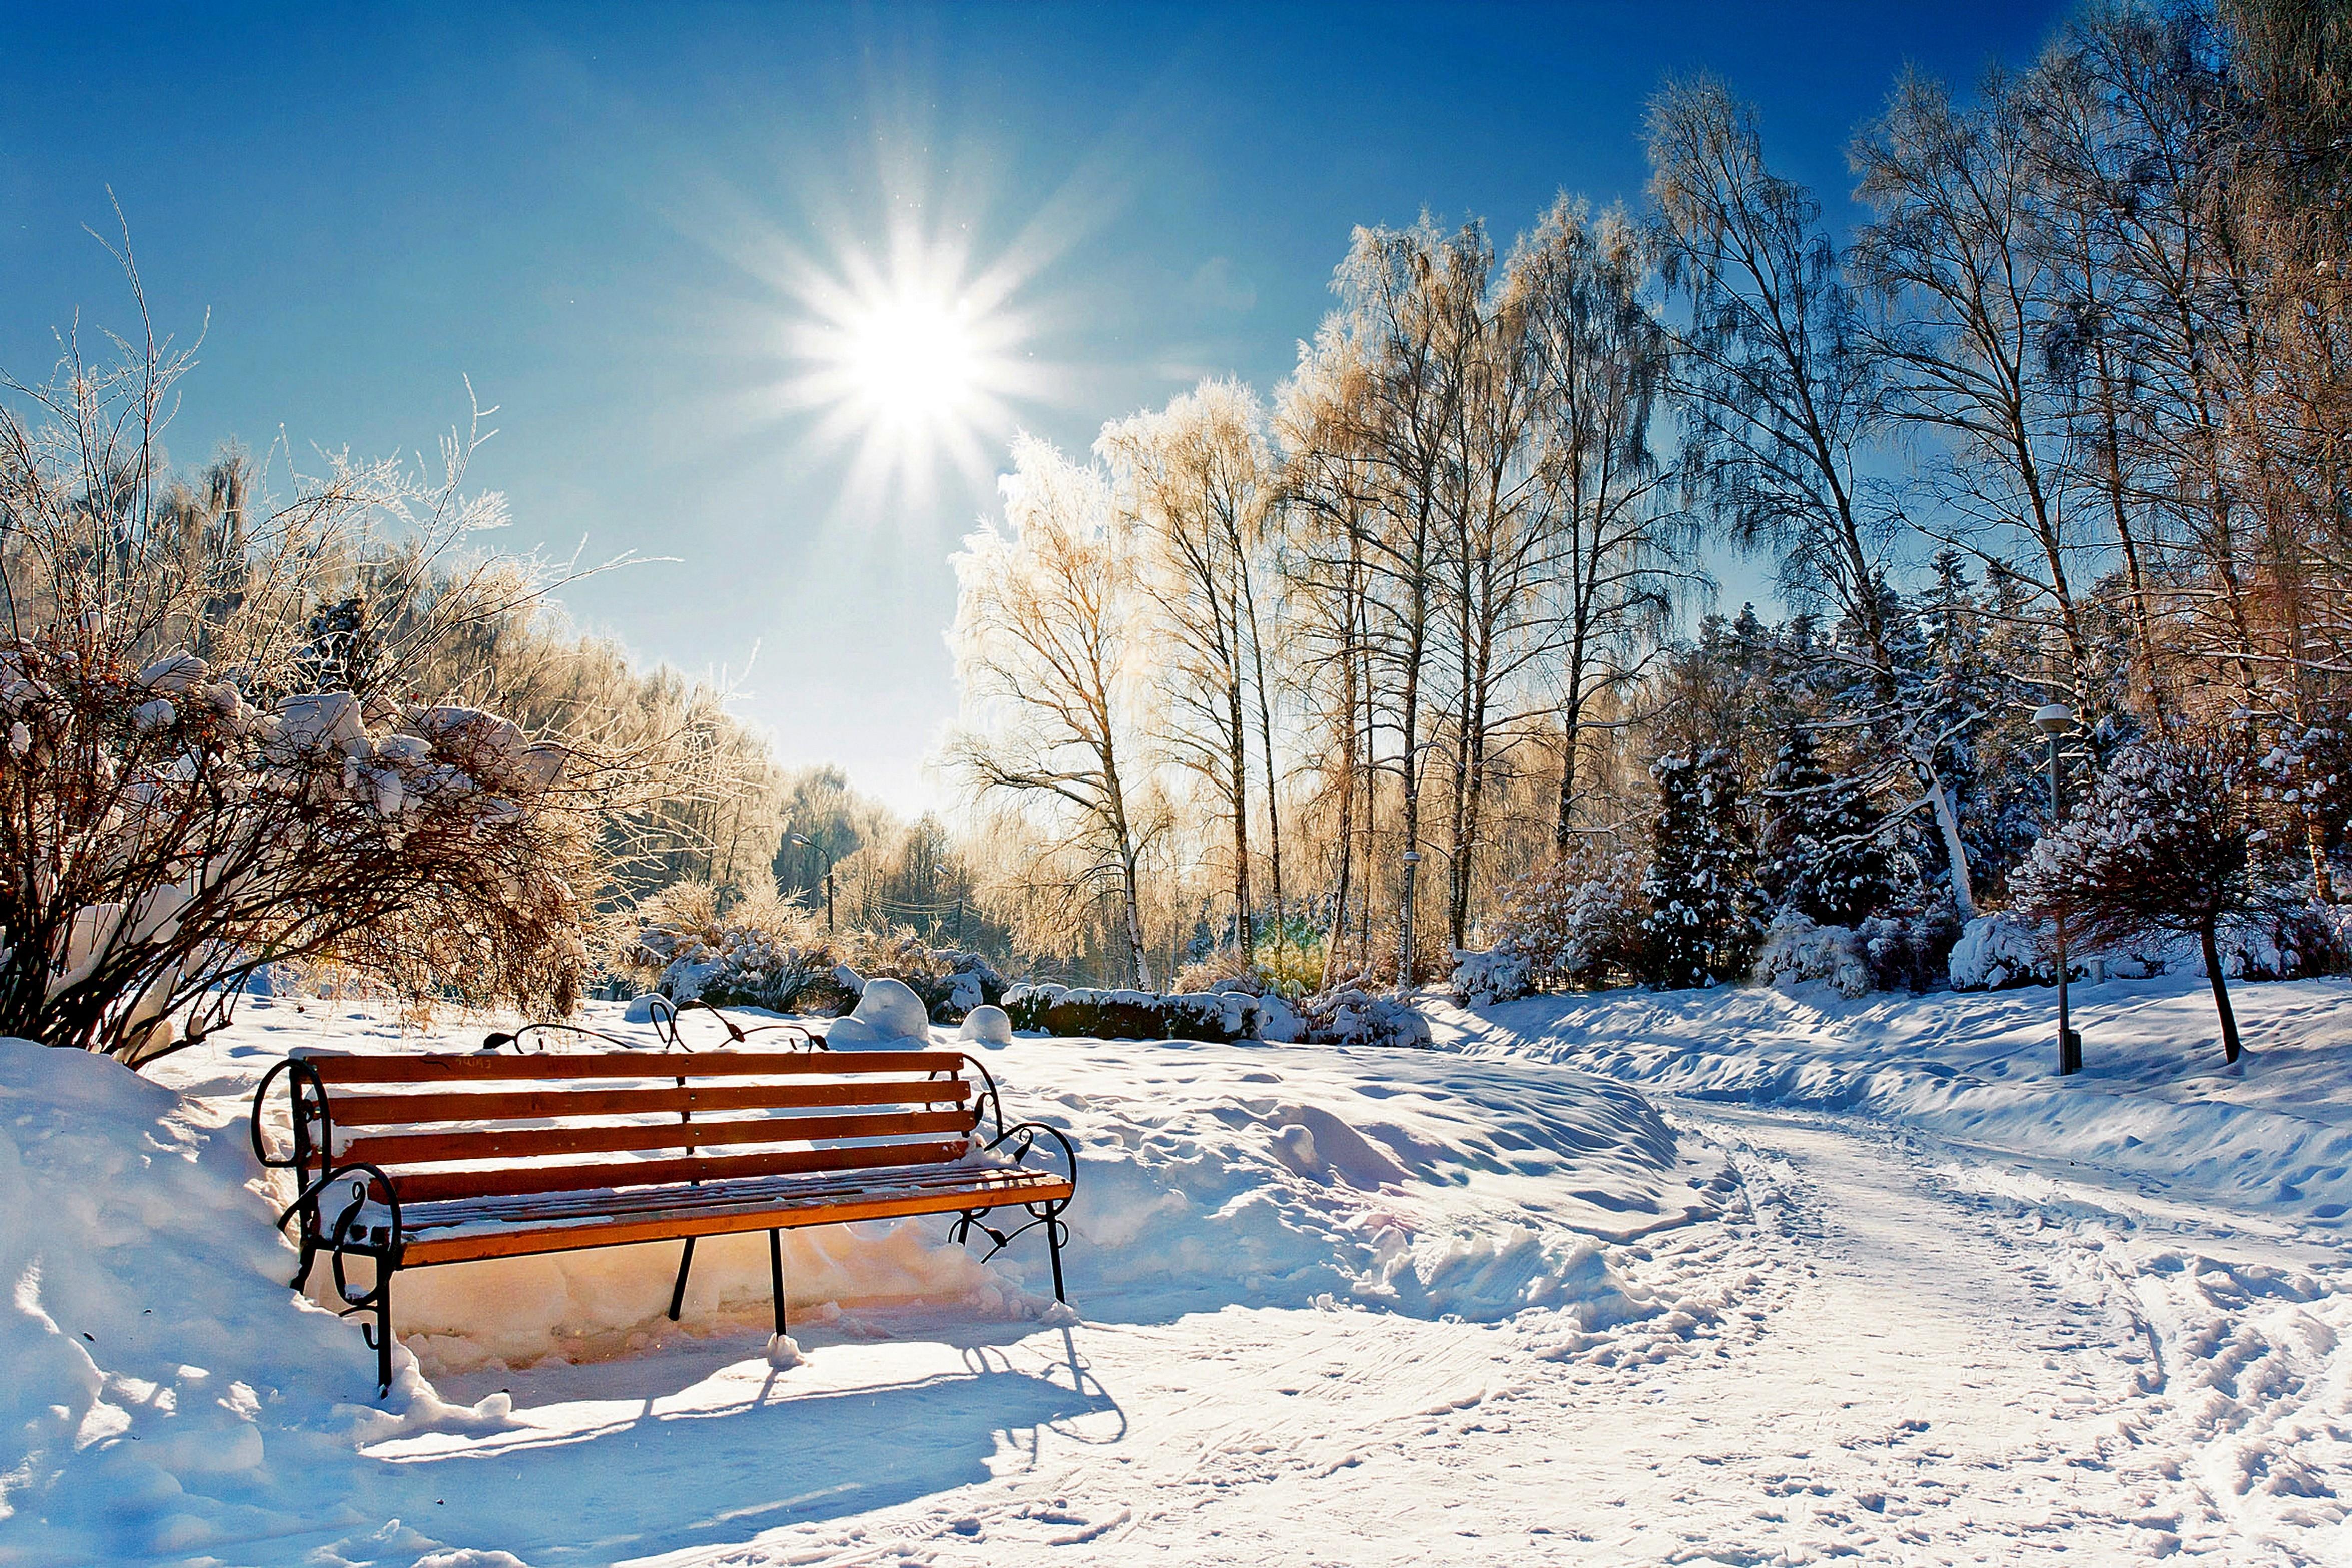 зимнее солнечное утро картинки